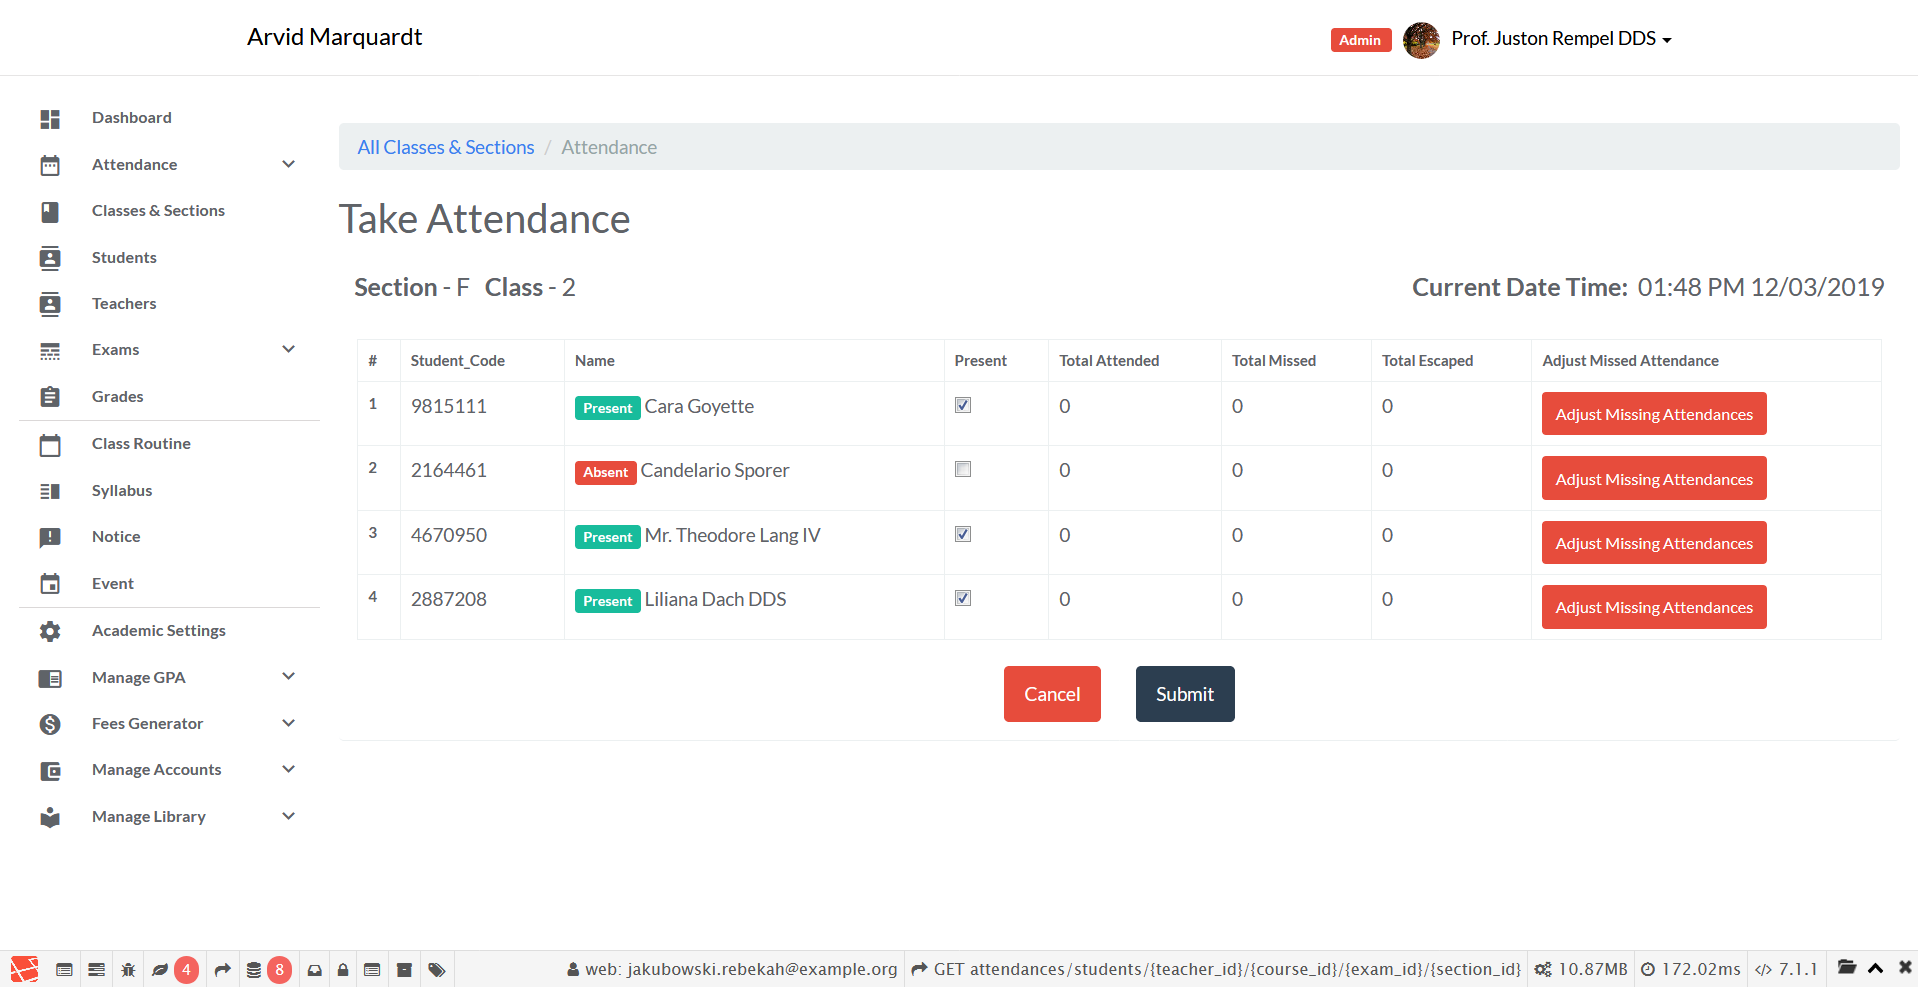 Screenshot_2019-03-12 Attendance - Arvid Marquardt(1)